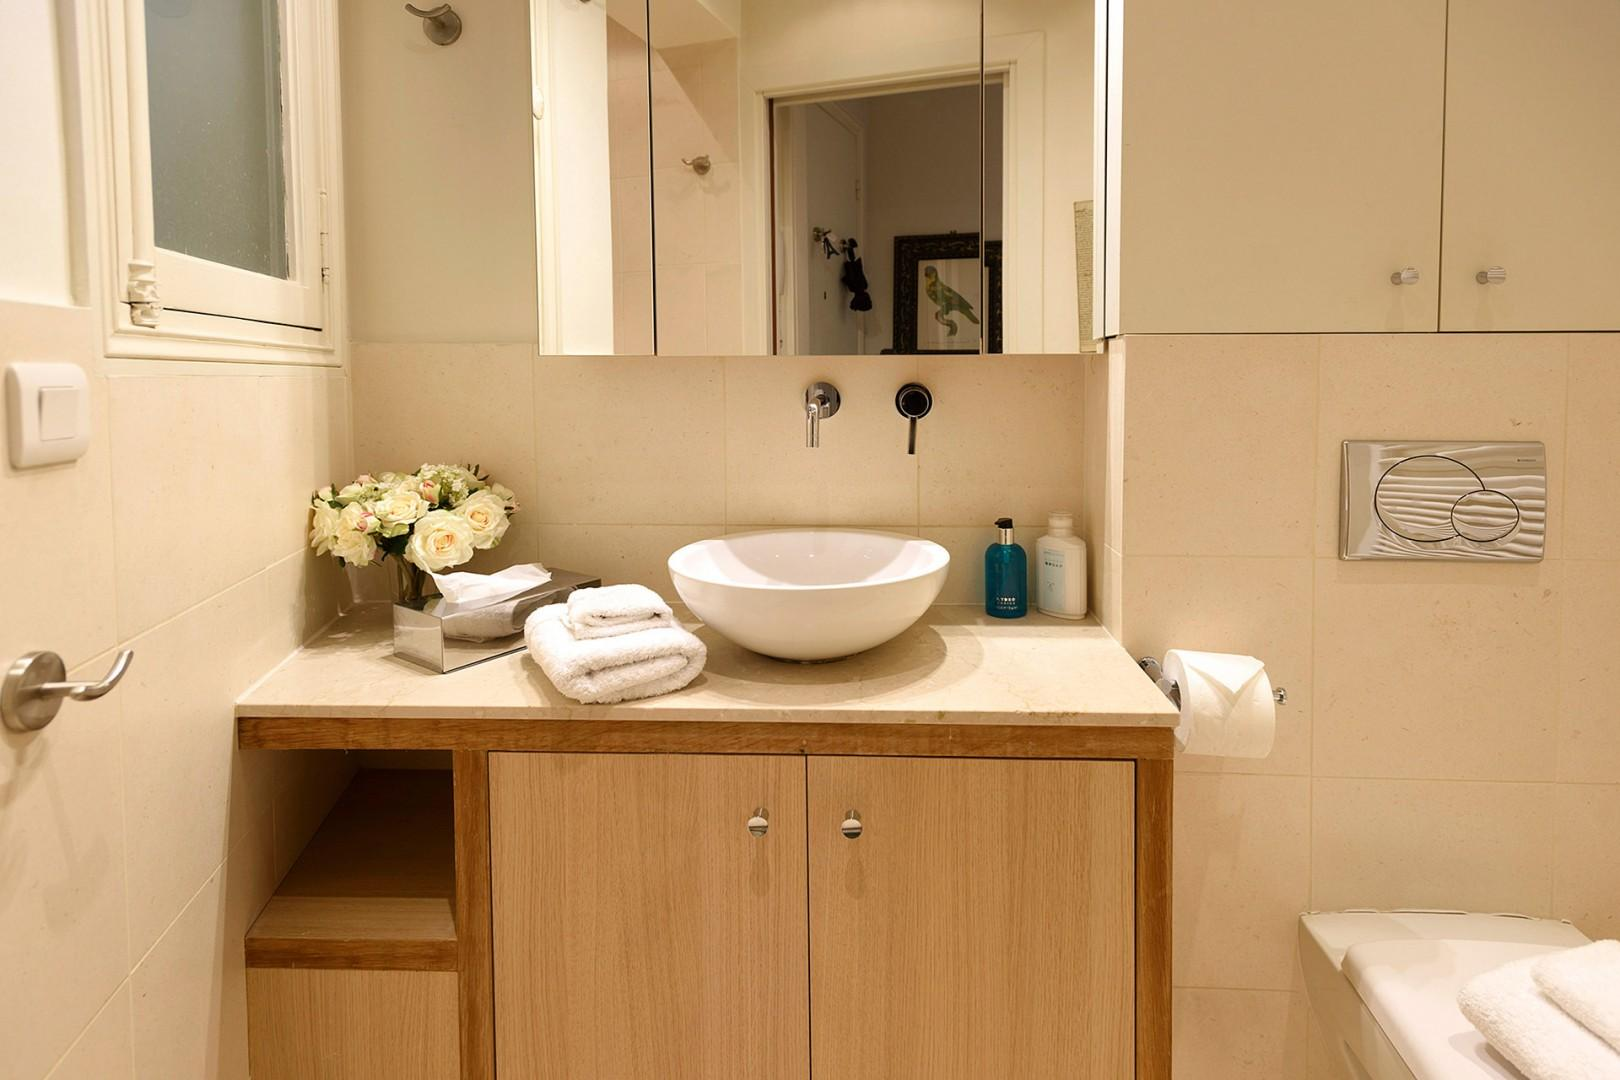 Pamper yourself in the beautiful modern bathroom.